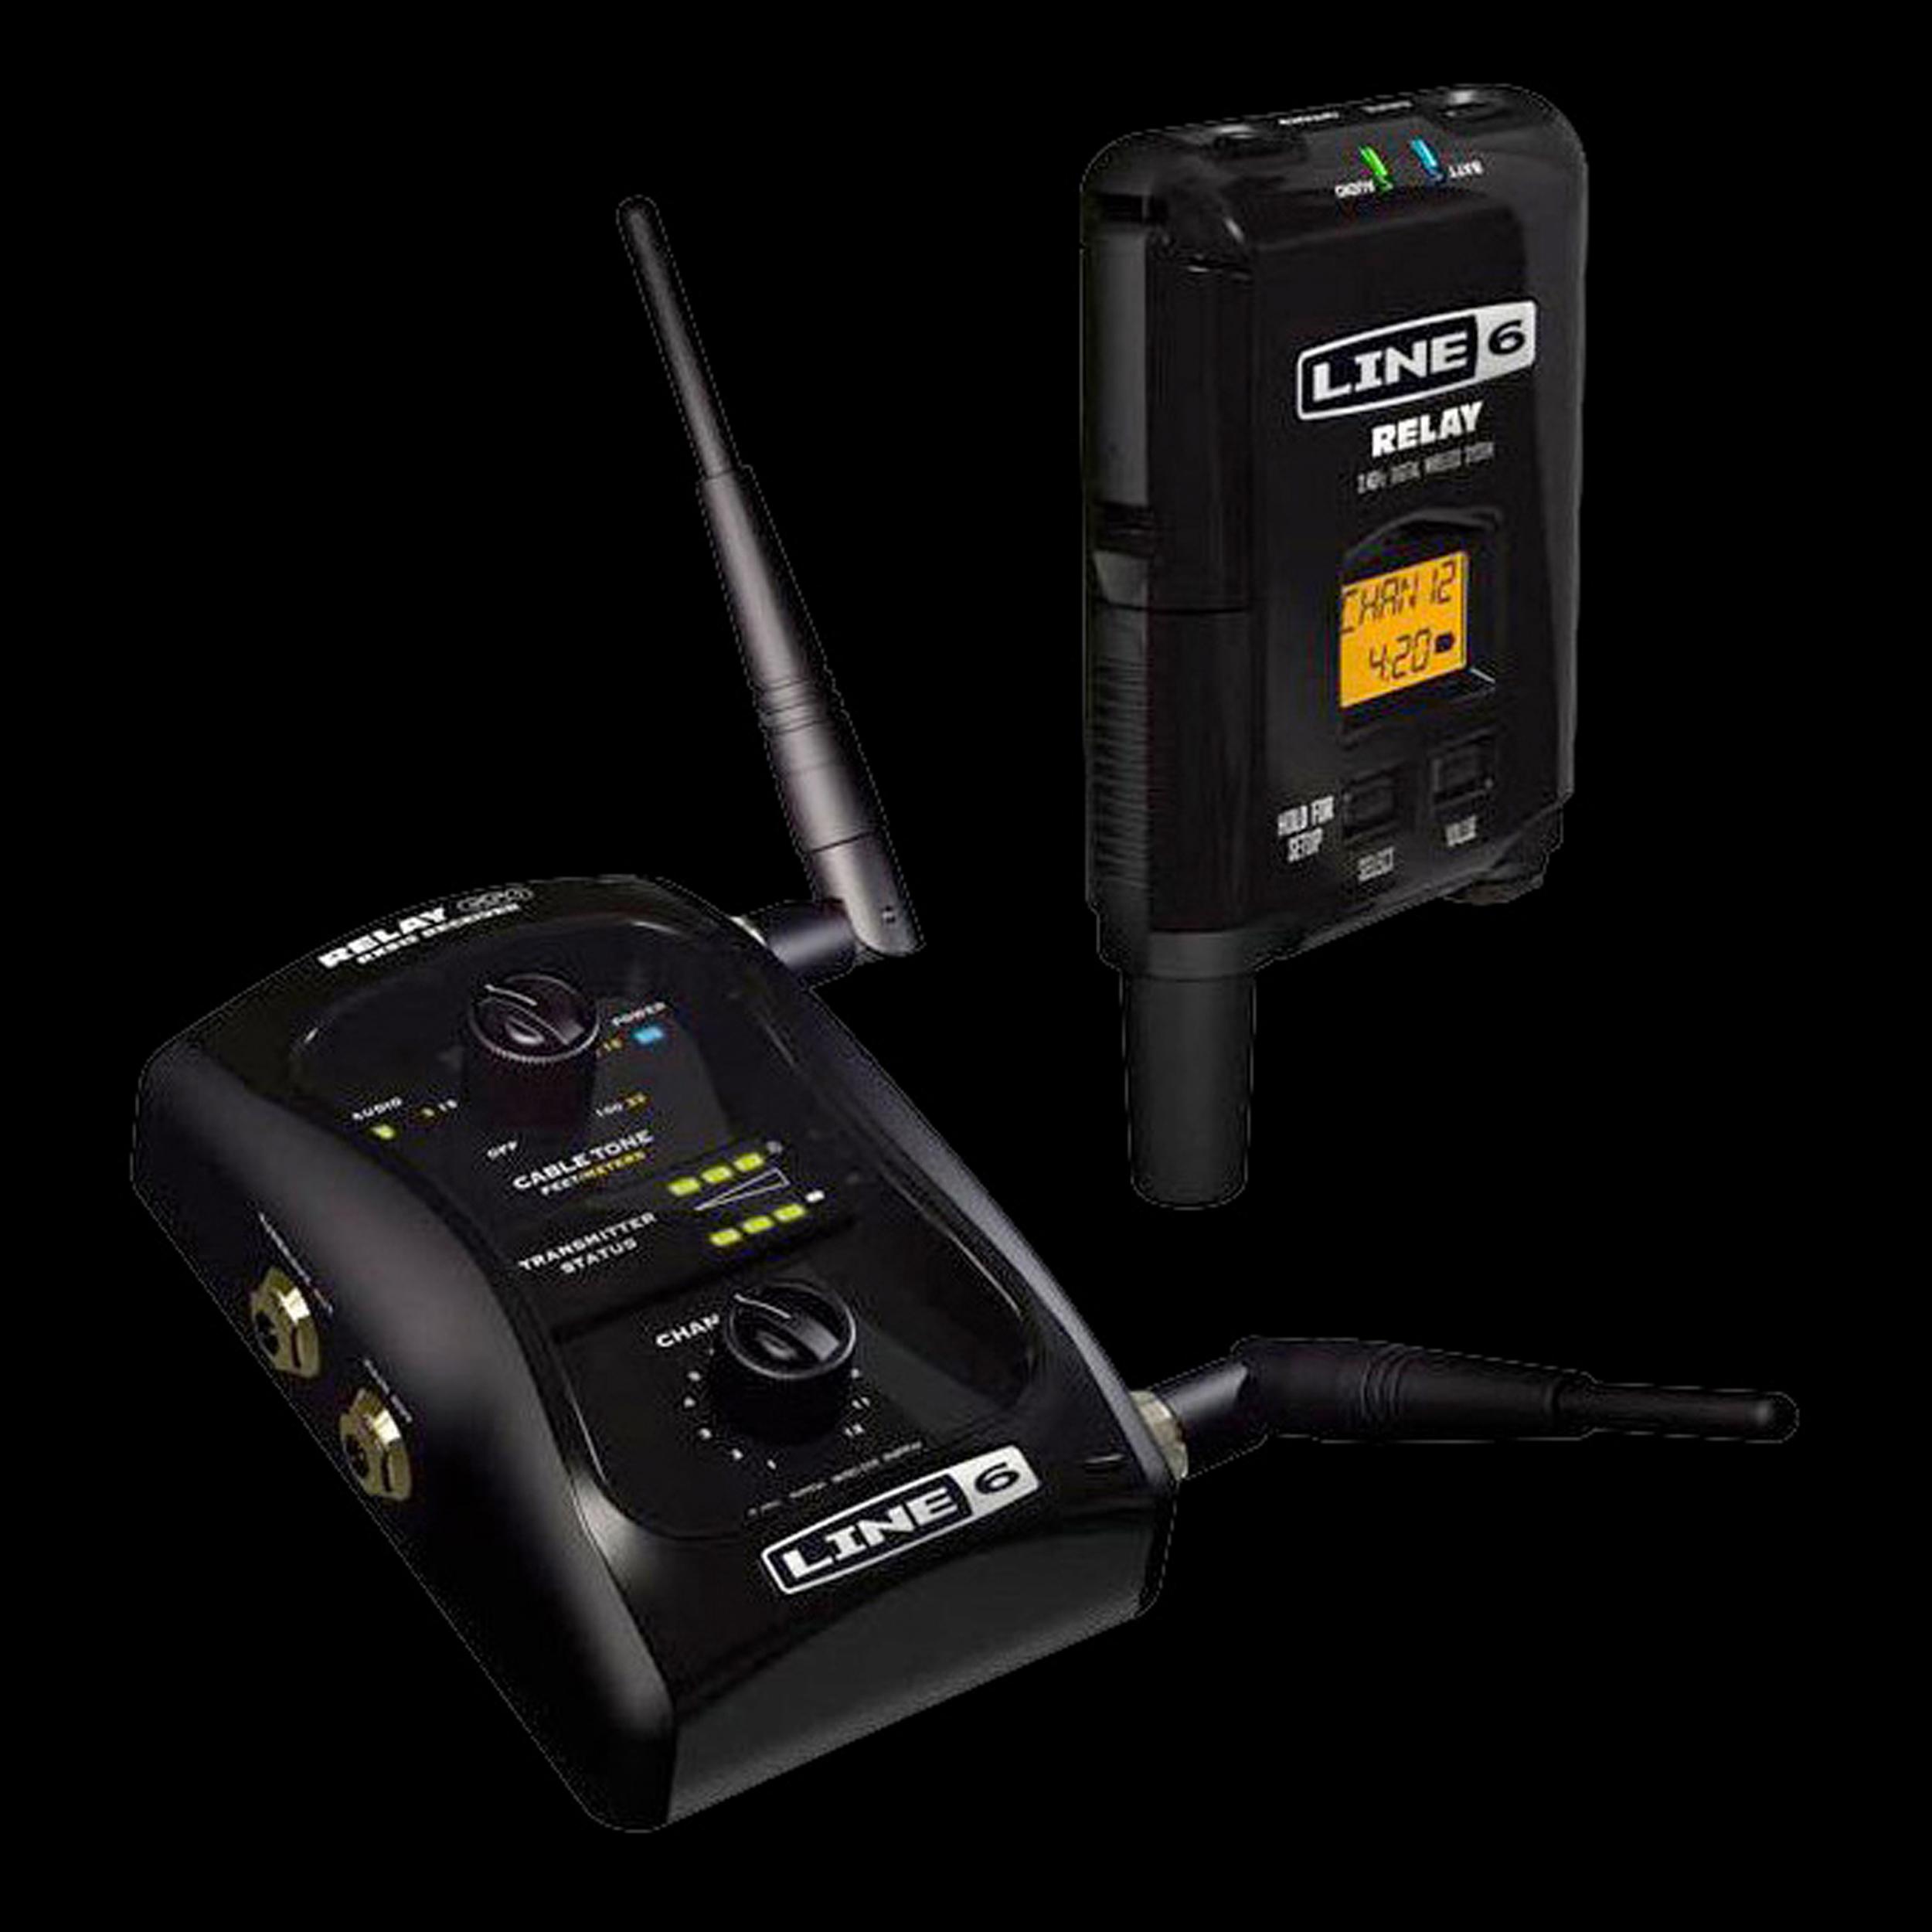 line 6 g50 relay wireless system ebay. Black Bedroom Furniture Sets. Home Design Ideas